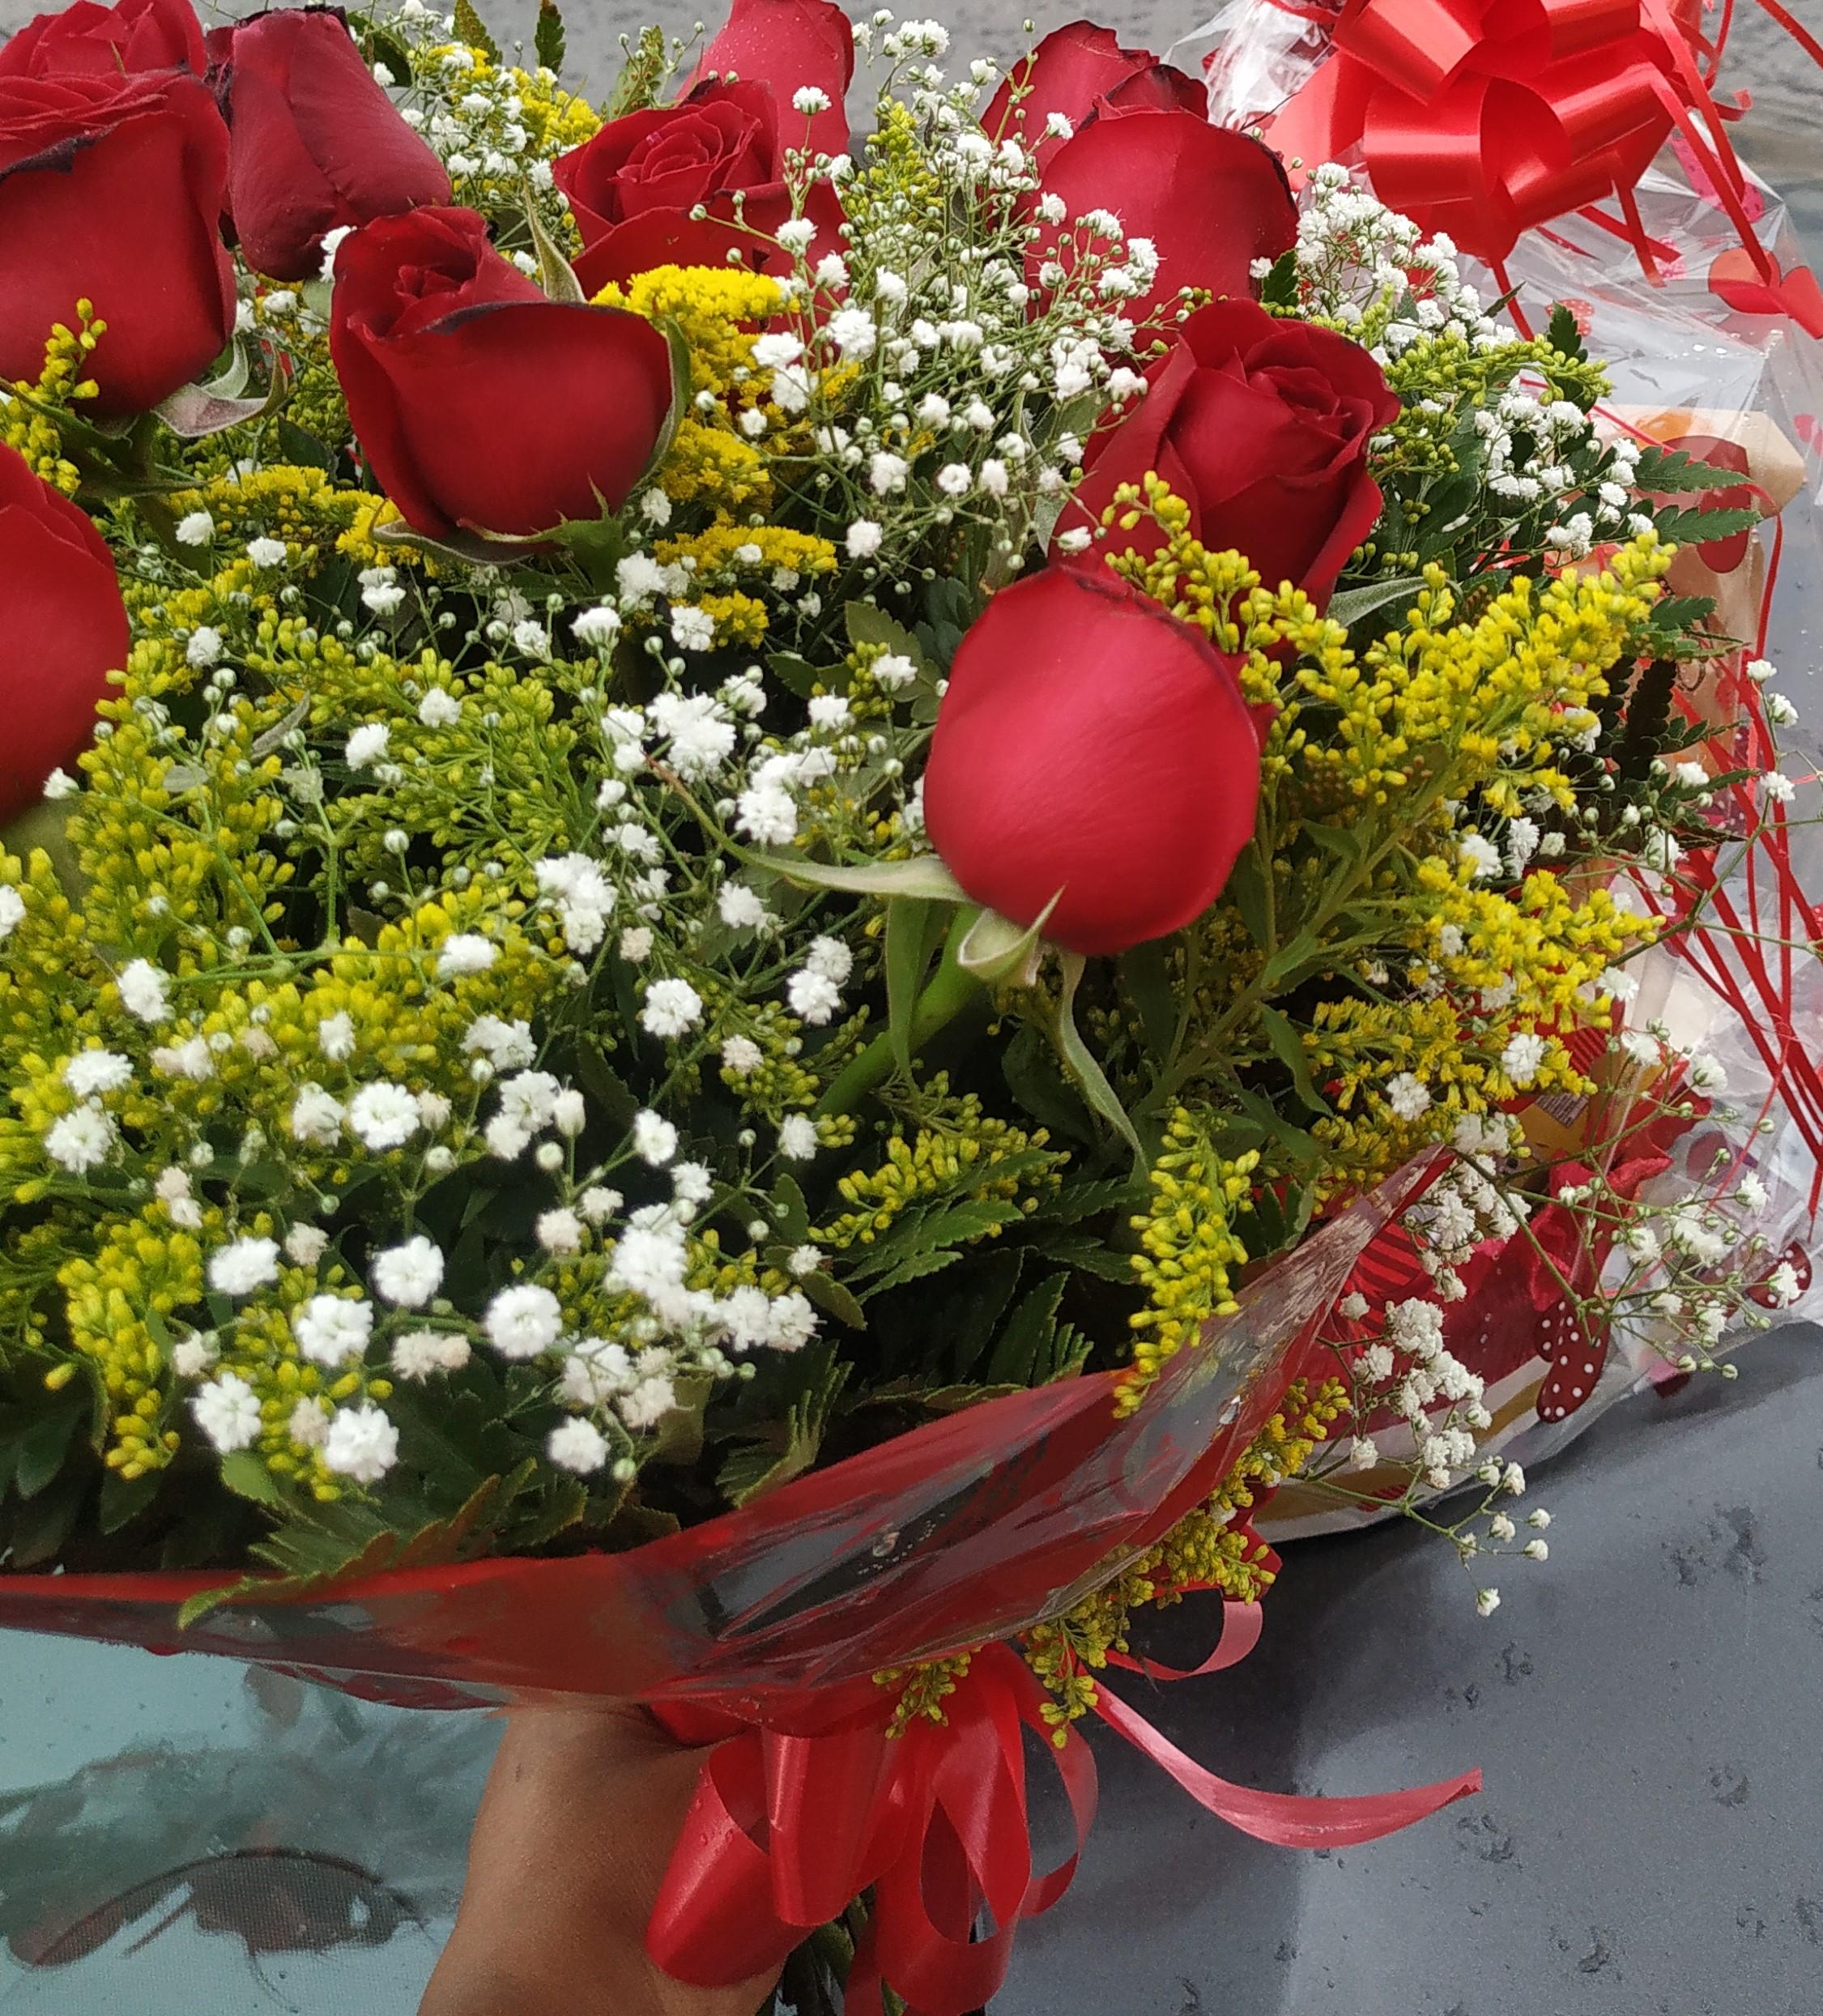 Buquê de flores 12 rosas R$ 100